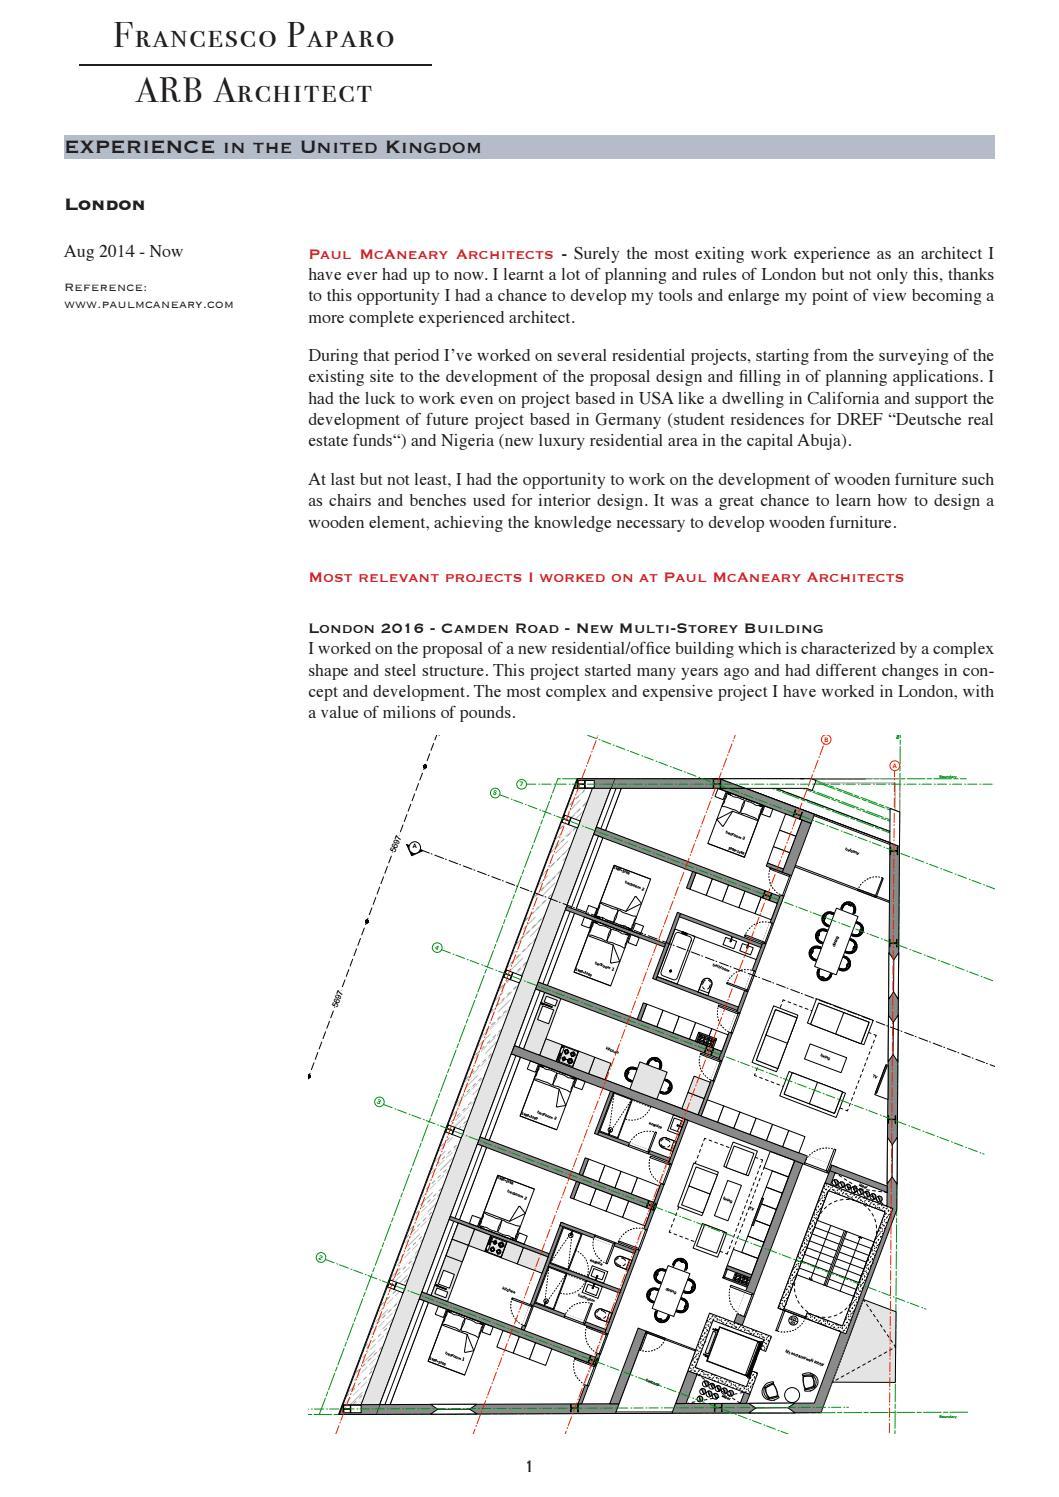 Portfolio works paul mcaneary architects london 2014 2017 by francesco paparo issuu